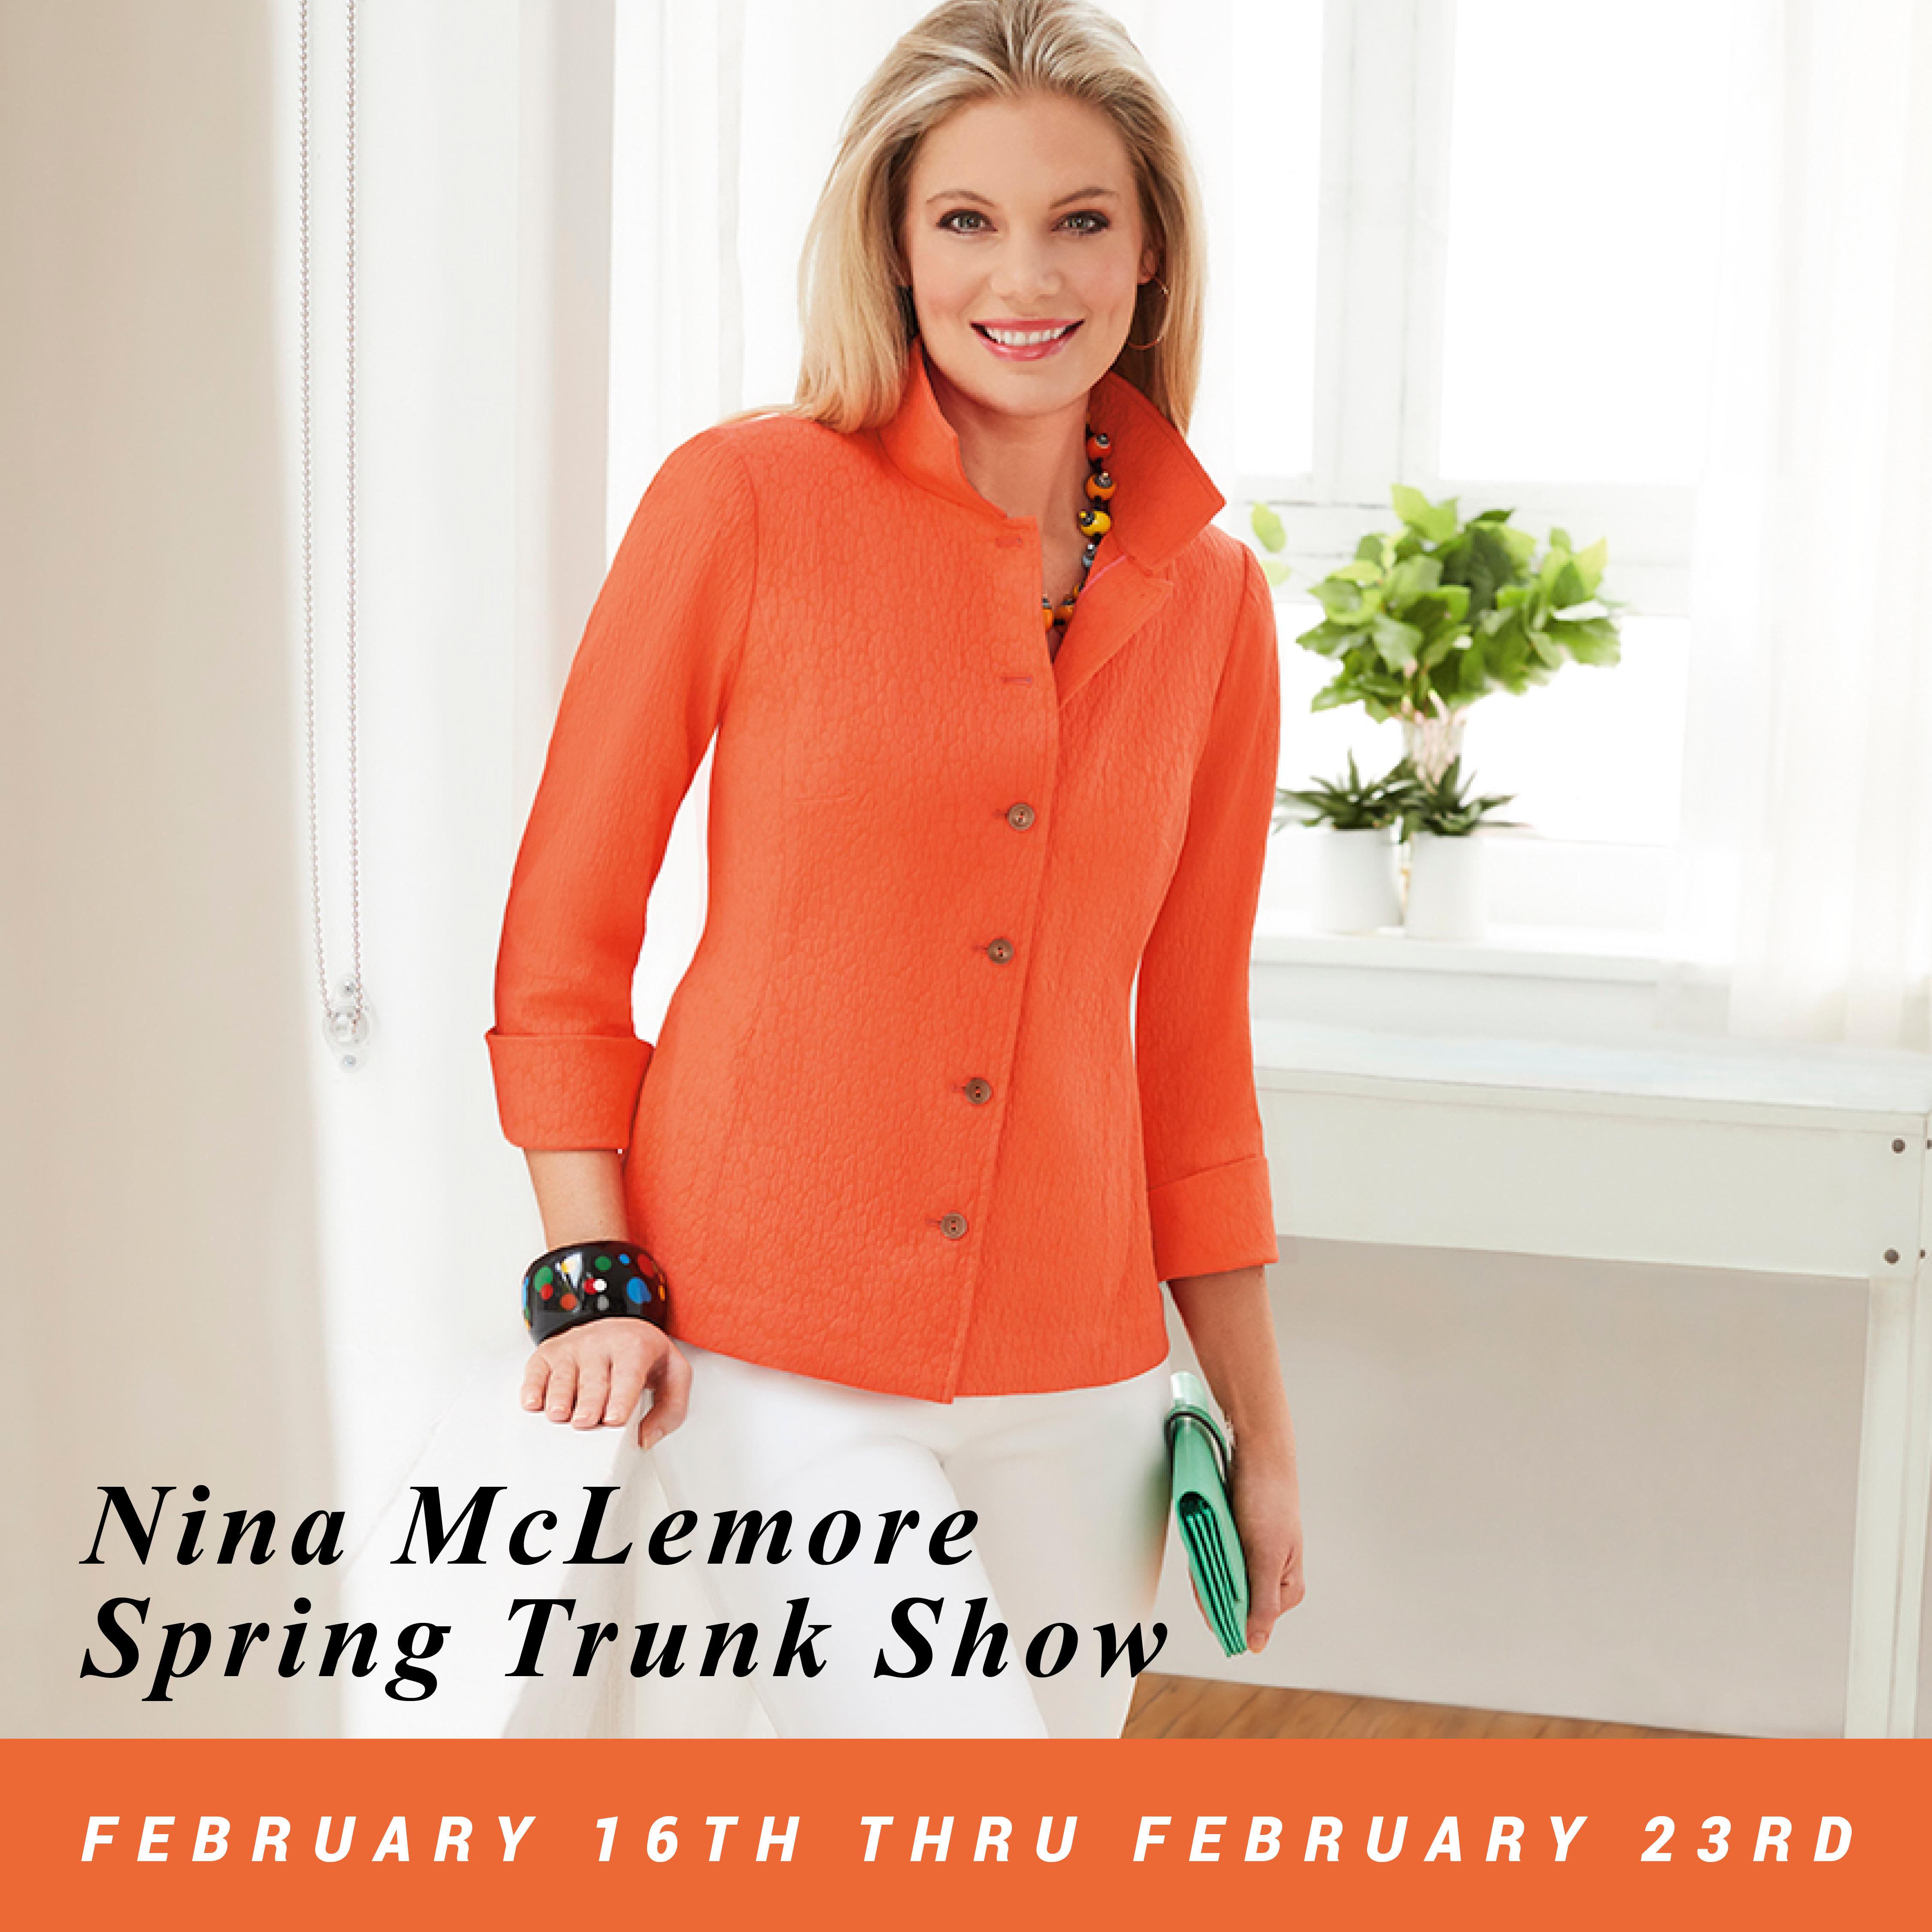 Nina McLemore Spring Trunk Show